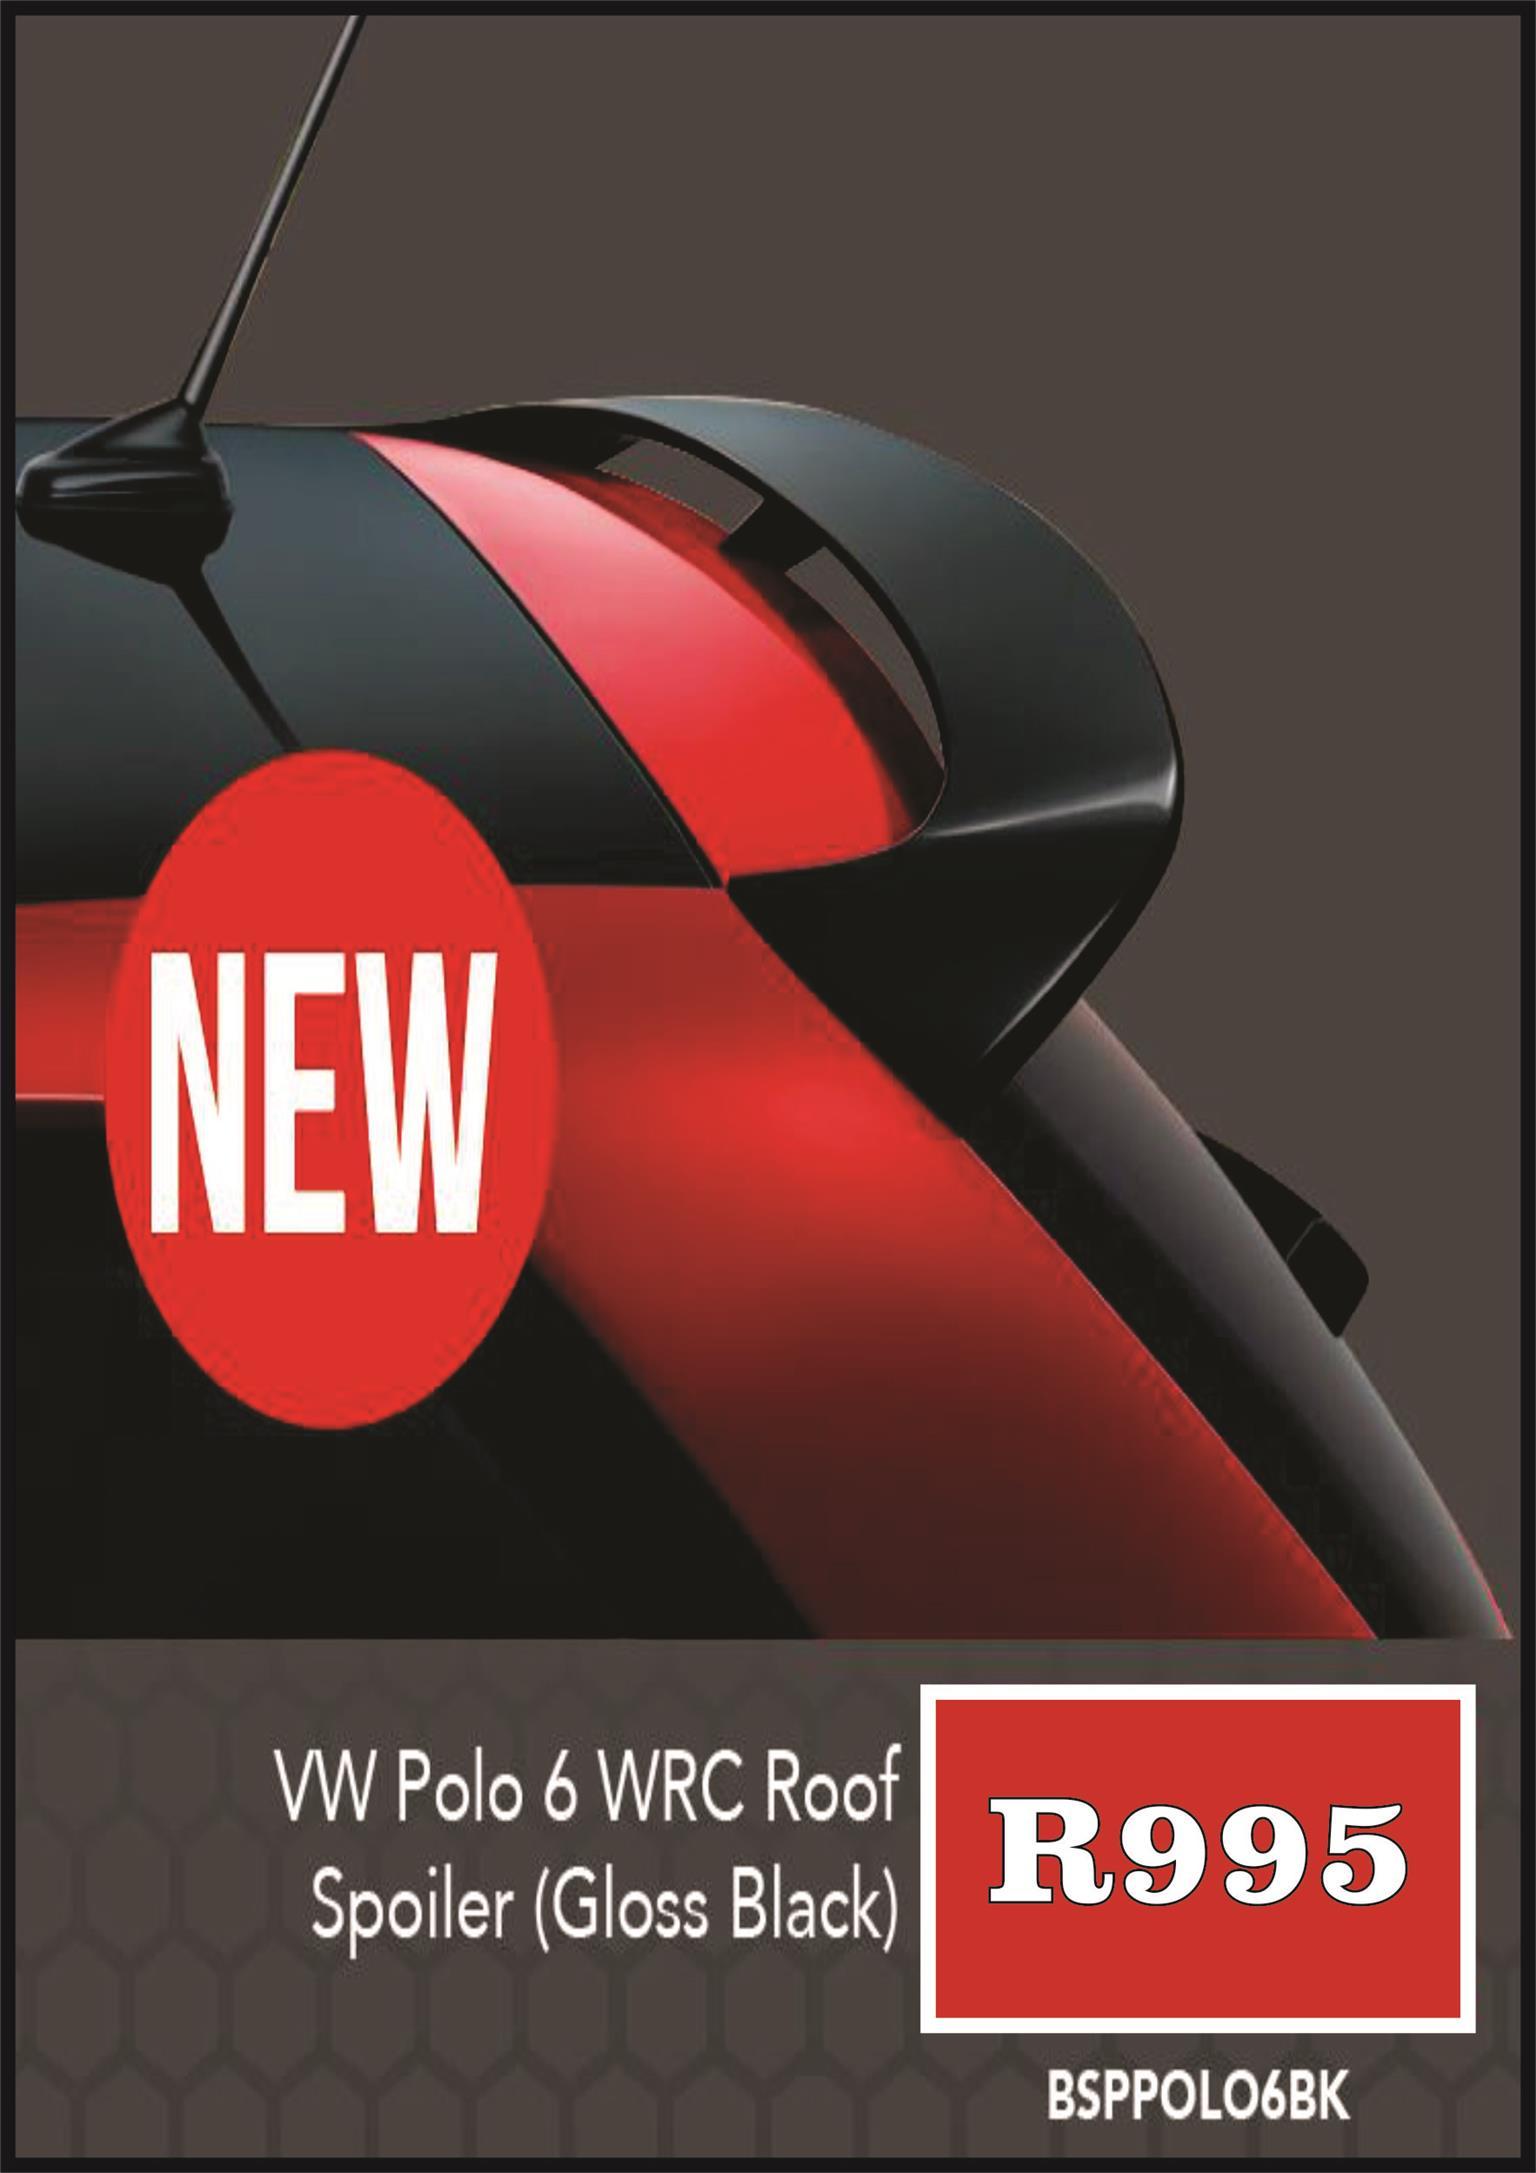 POLO 6 WRC STYLE SPOILER GLOSS BLACK